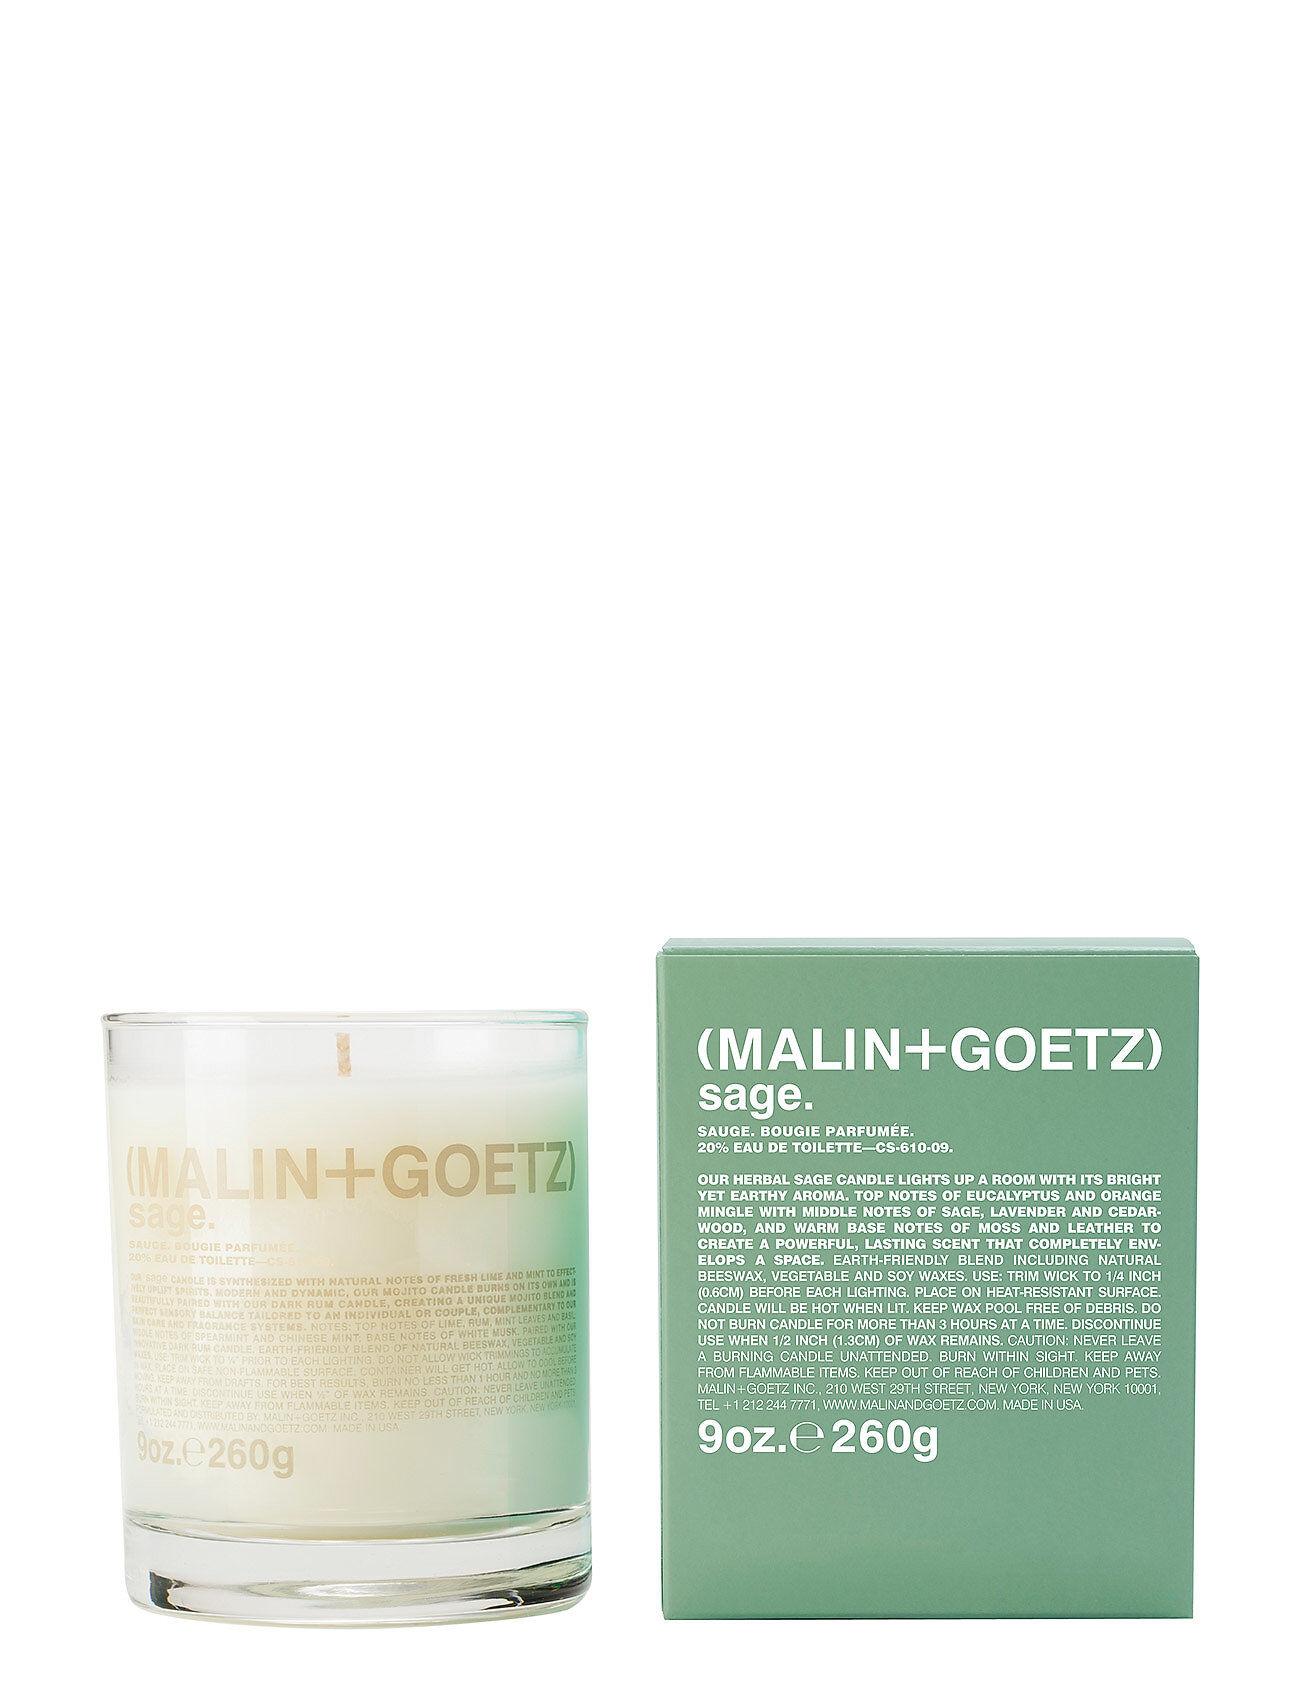 Malin+Goetz Sage Candle